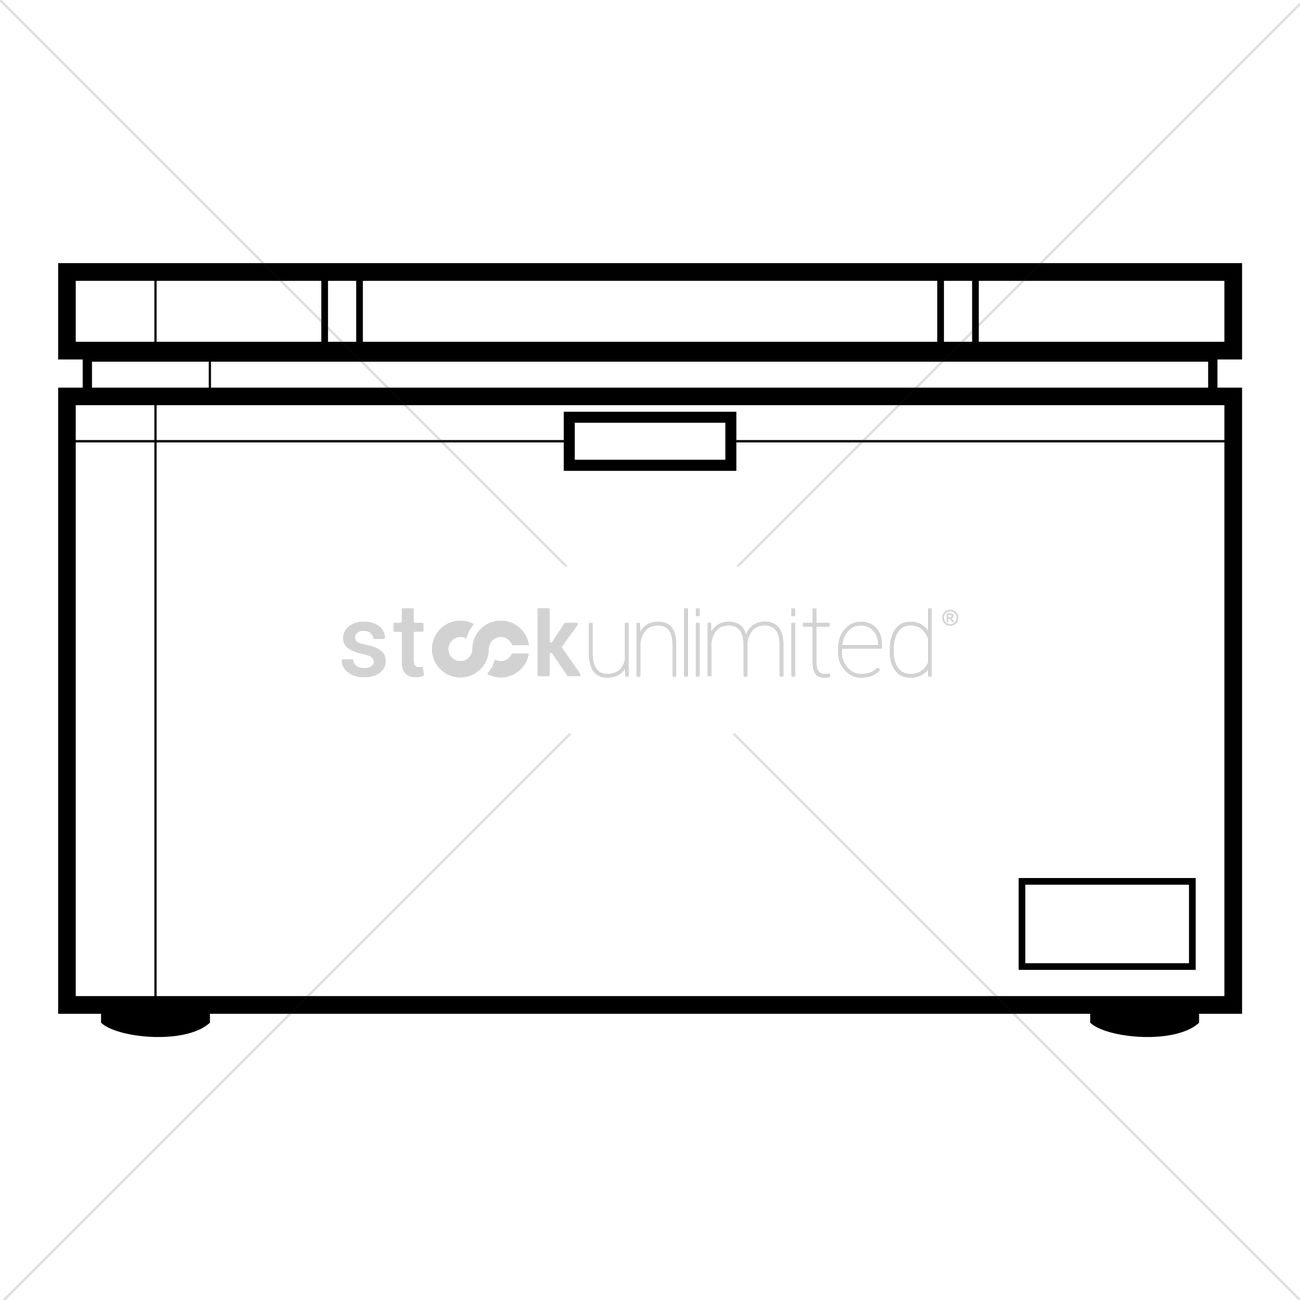 Chest freezer clipart png transparent stock Collection of Freezer clipart | Free download best Freezer clipart ... png transparent stock